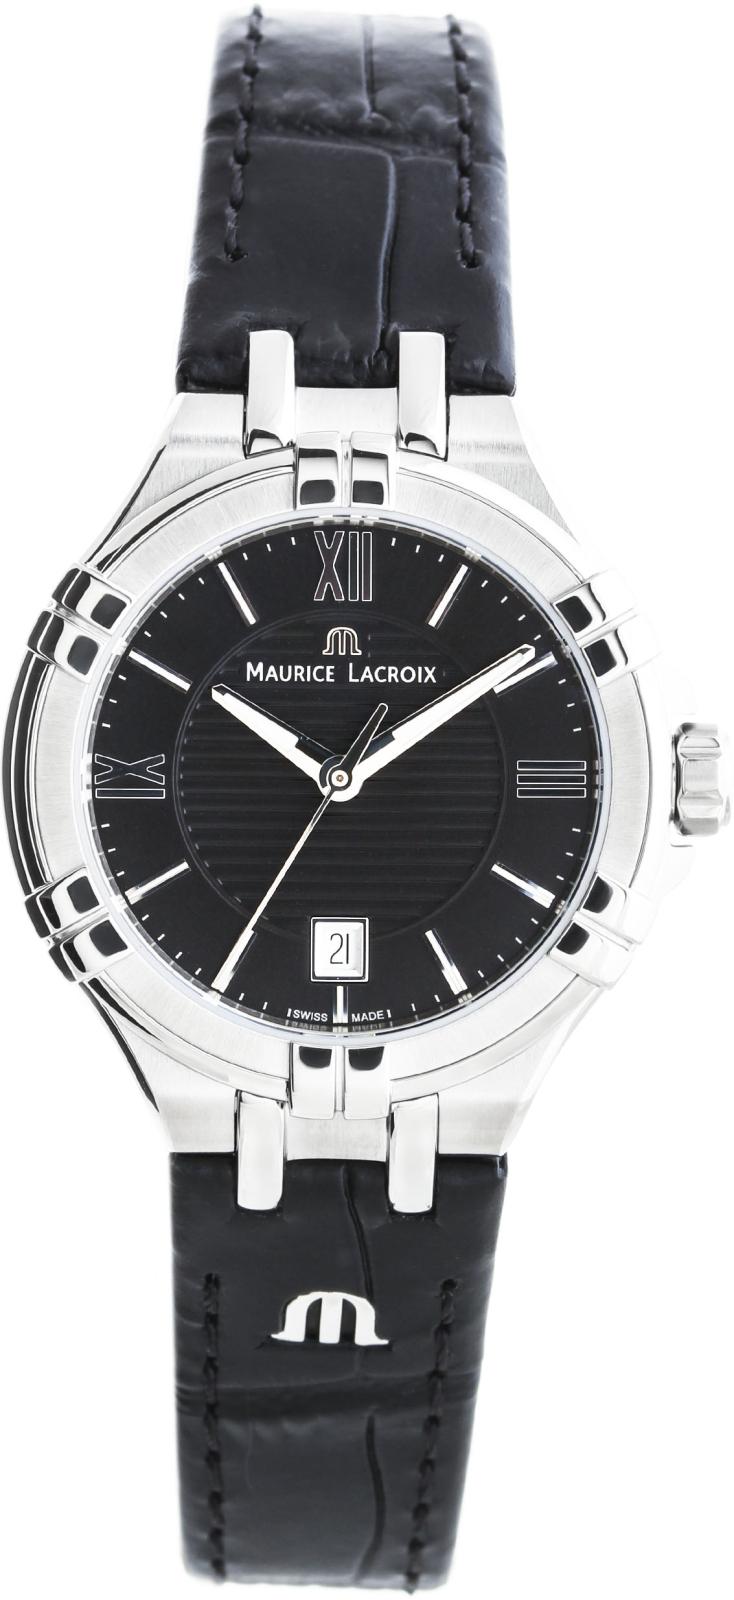 Maurice Lacroix Aikon AI1004-SS001-330-1Наручные часы<br>Швейцарские часы Maurice Lacroix Aikon AI1004-SS001-330-1<br><br>Пол: Женские<br>Страна-производитель: Швейцария<br>Механизм: Кварцевый<br>Материал корпуса: Сталь<br>Материал ремня/браслета: Кожа<br>Водозащита, диапазон: None<br>Стекло: Сапфировое<br>Толщина корпуса: None<br>Стиль: None